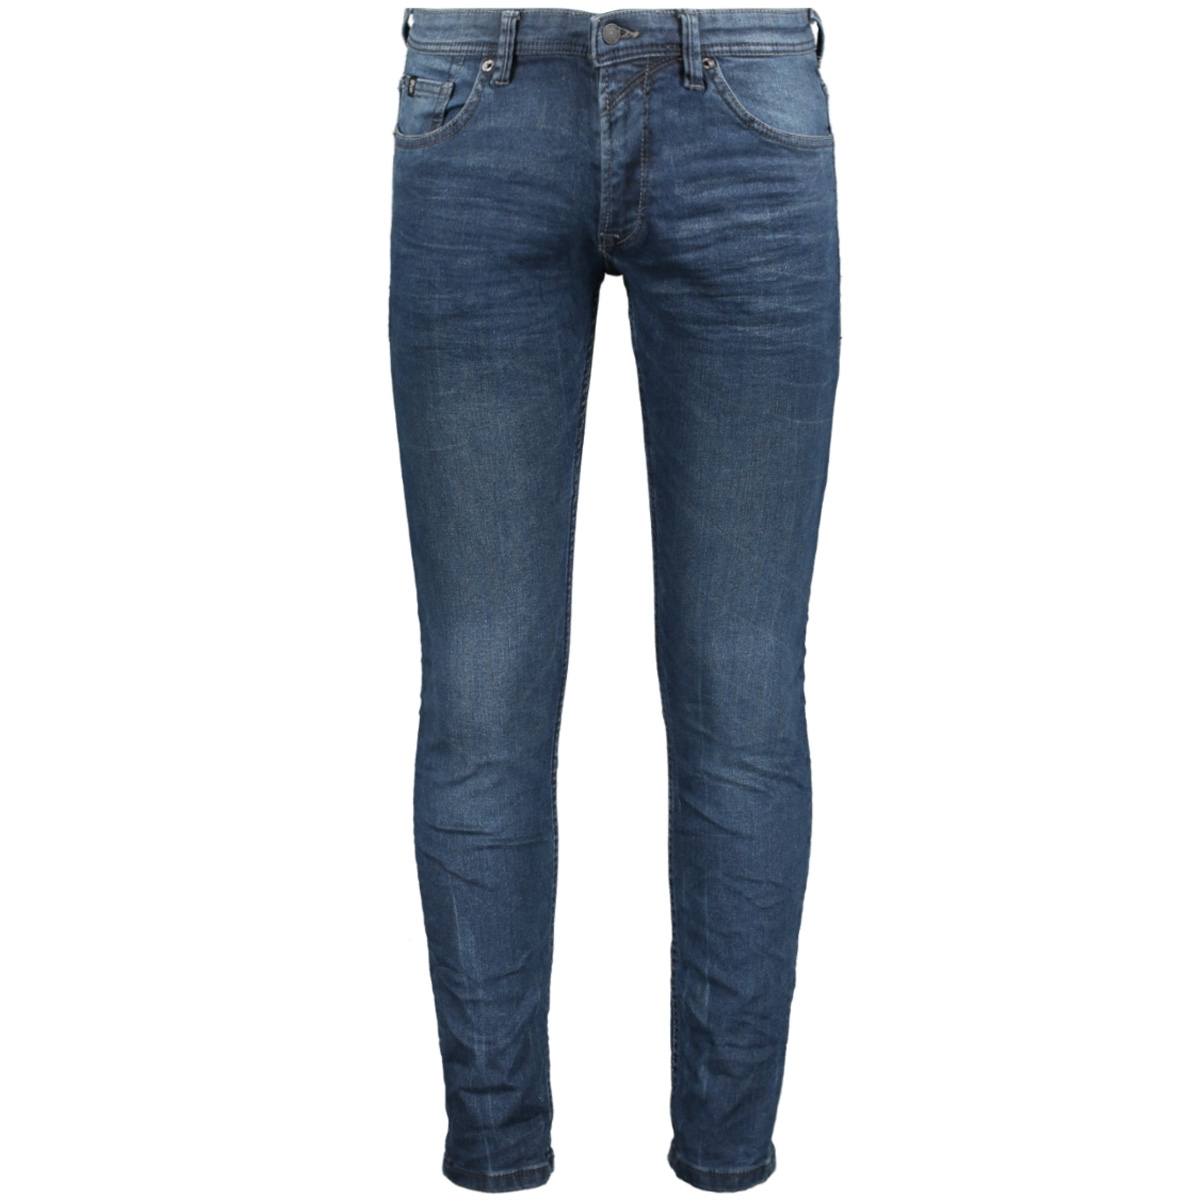 slimfit jeans 1013808xx12 tom tailor jeans 10135